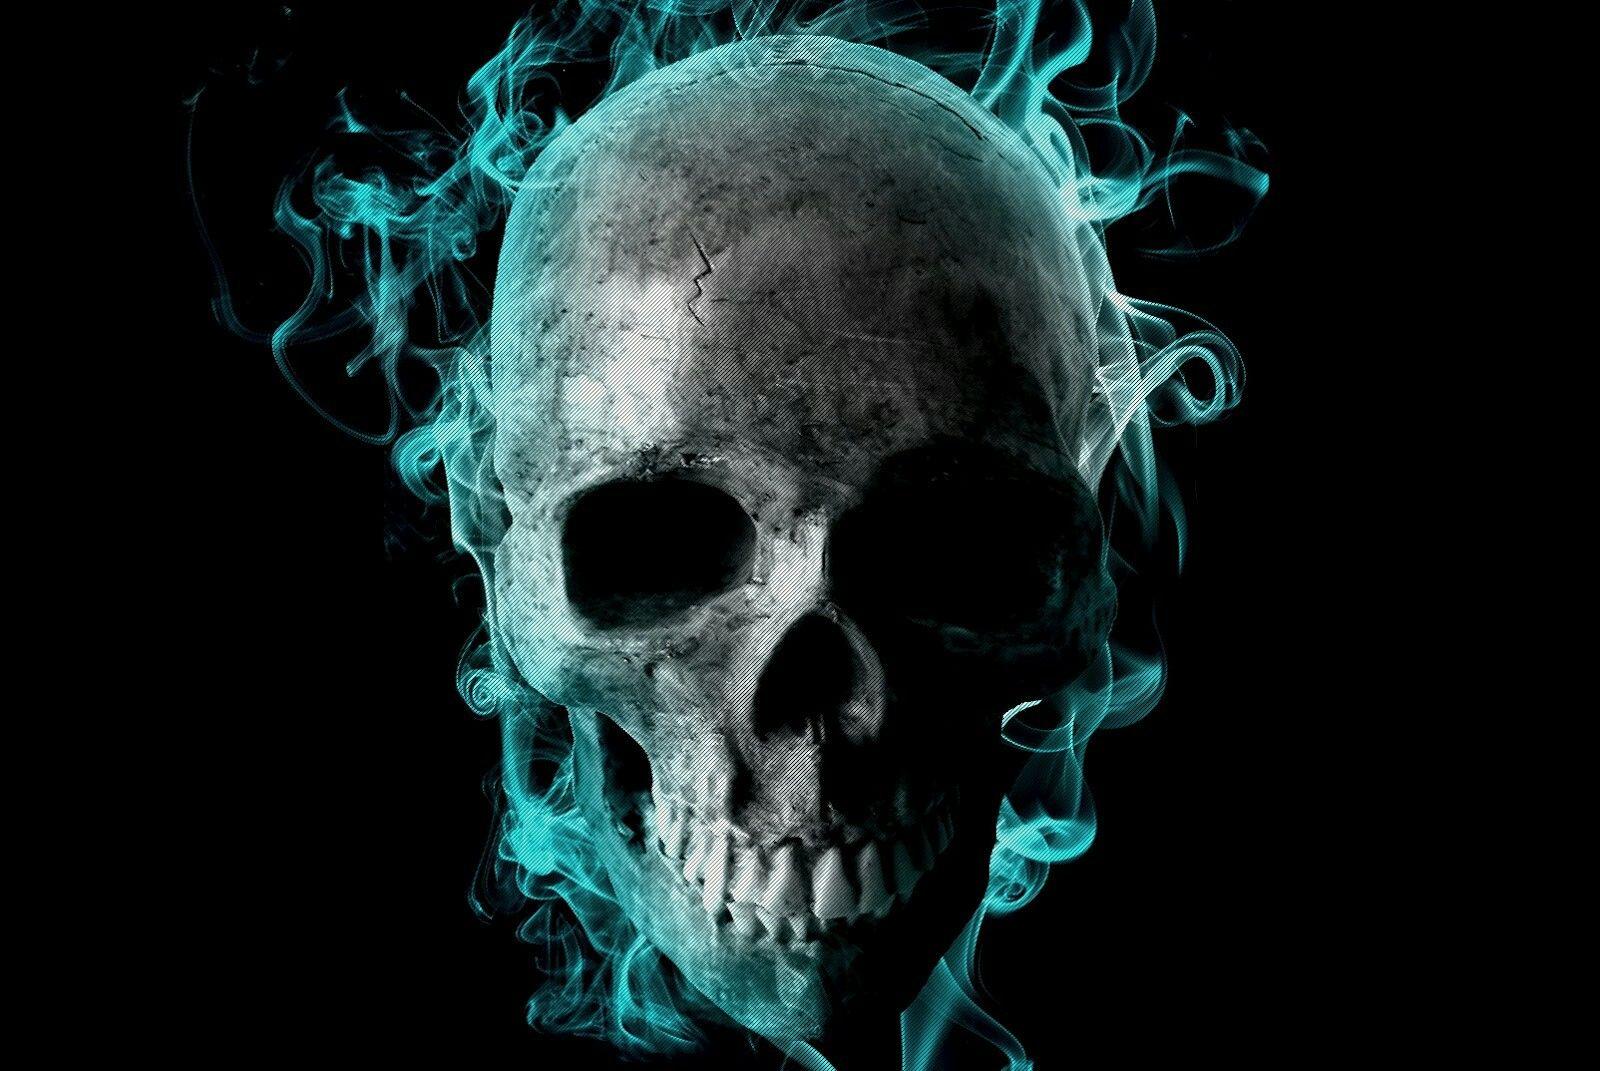 Pin By Nicoso Grogg On Wallpaper In 2019 Skull Wallpaper Skull Pictures Hd Skull Wallpapers